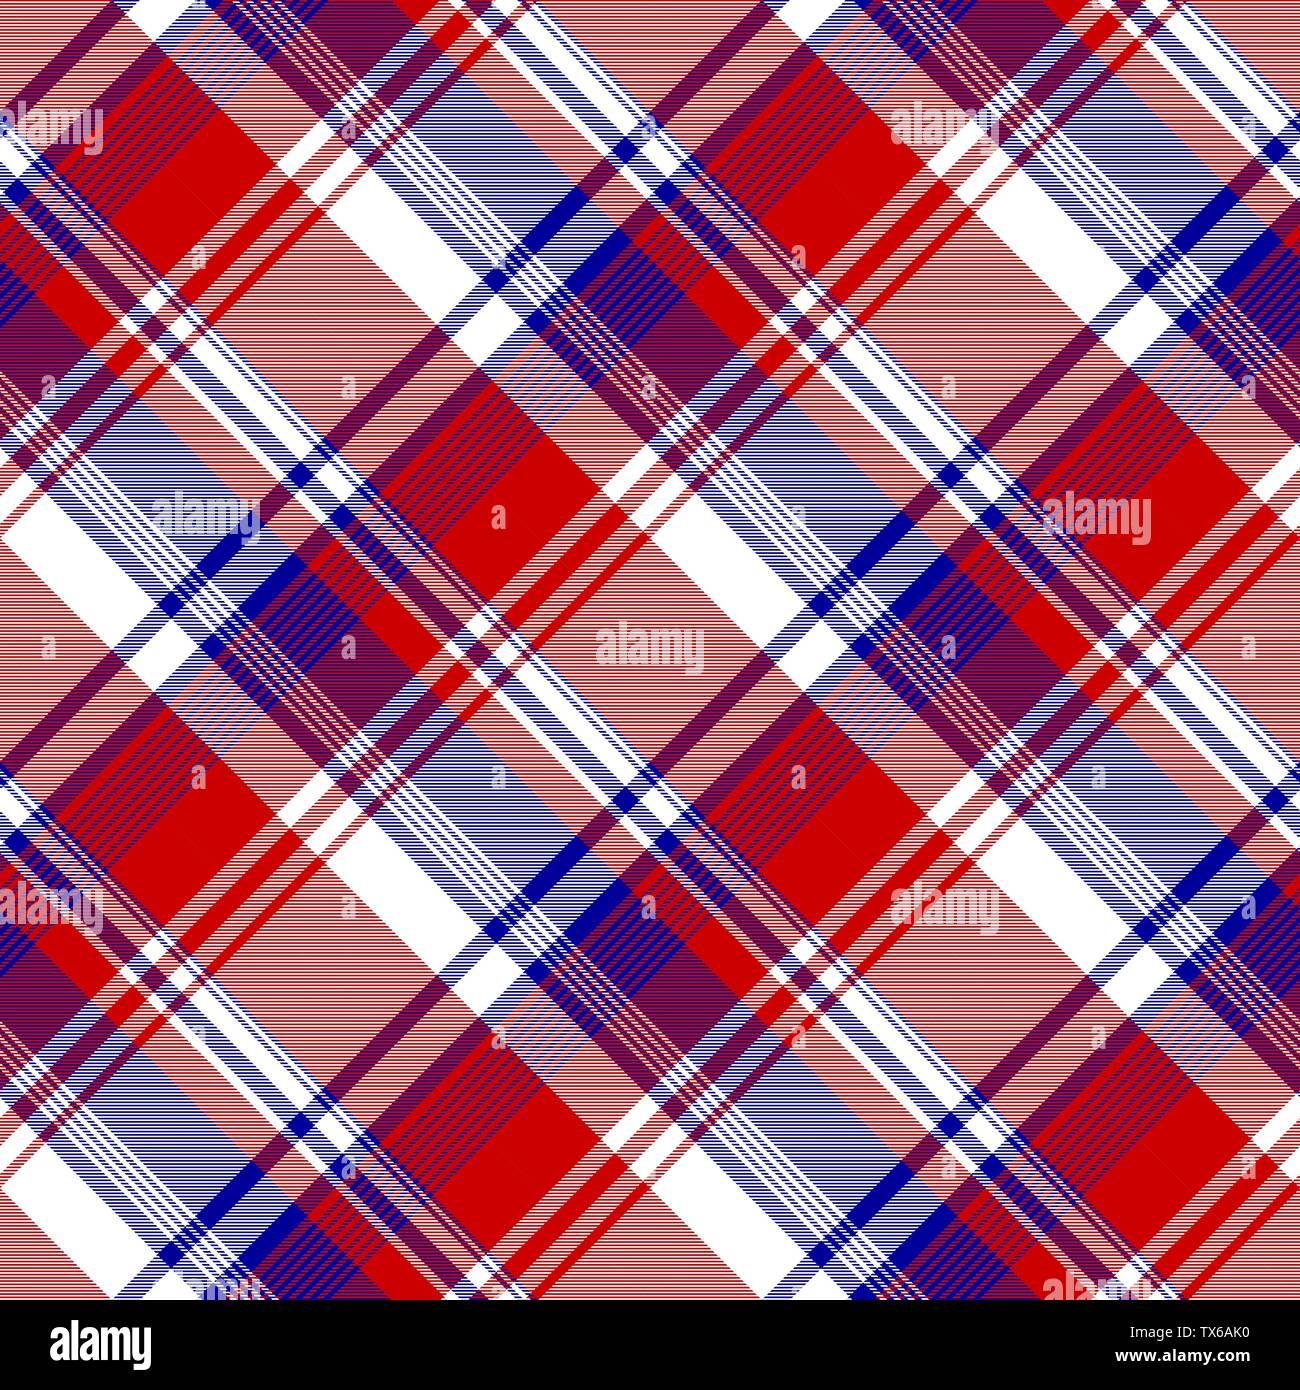 Diagonal pattern seamless fabric texture. Vector illustration. - Stock Vector